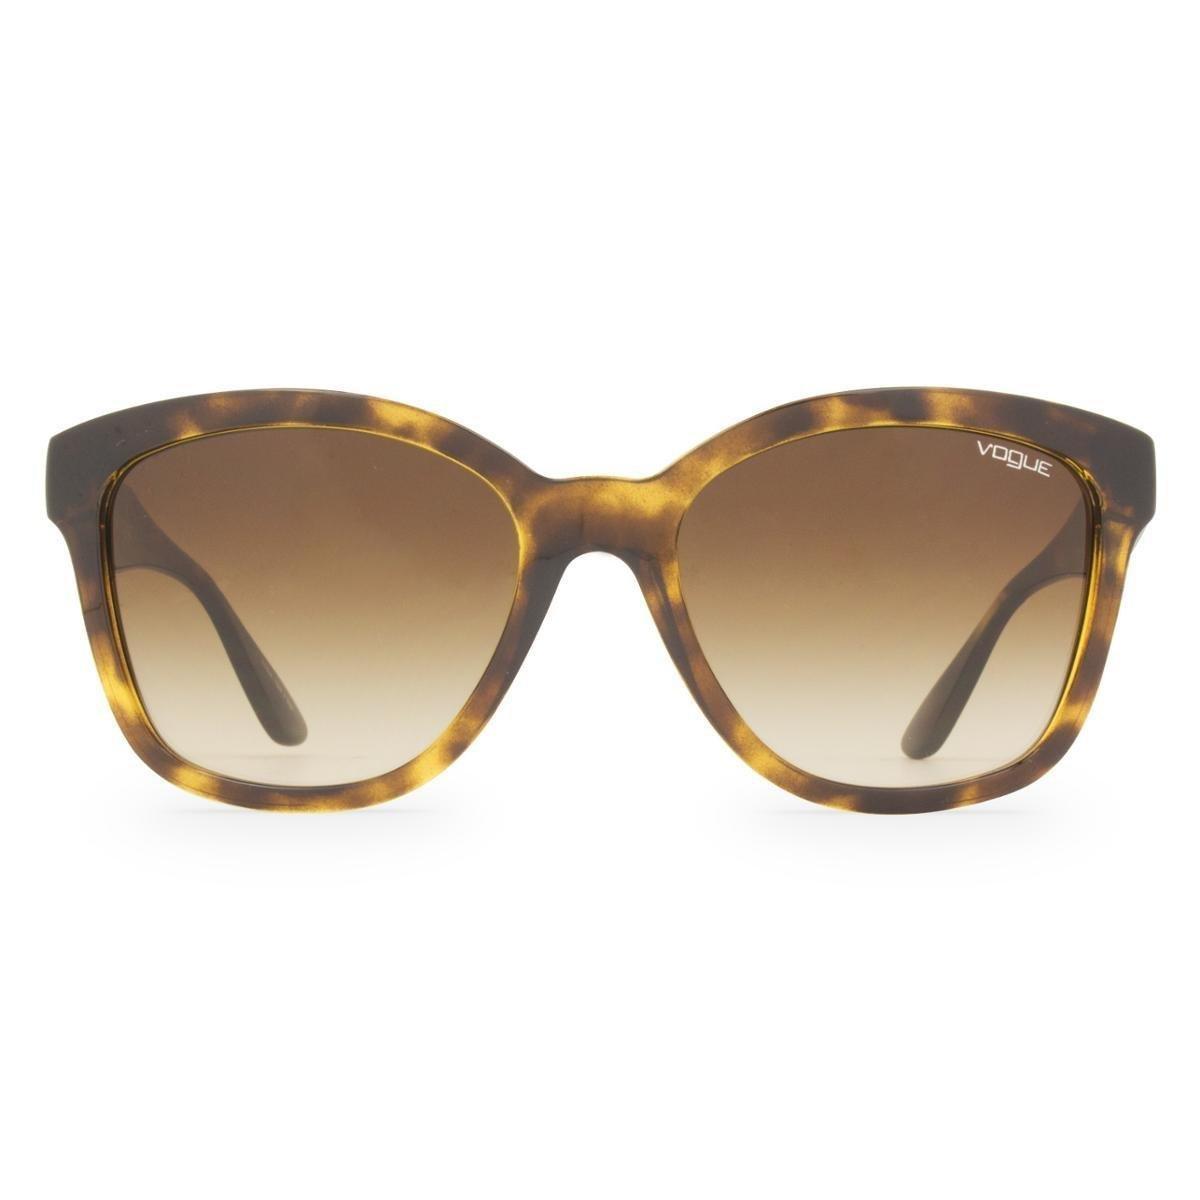 d561d7cb0 Óculos de Sol Vogue Astral VO5019SL W65613-55 Feminino - Marrom | Zattini